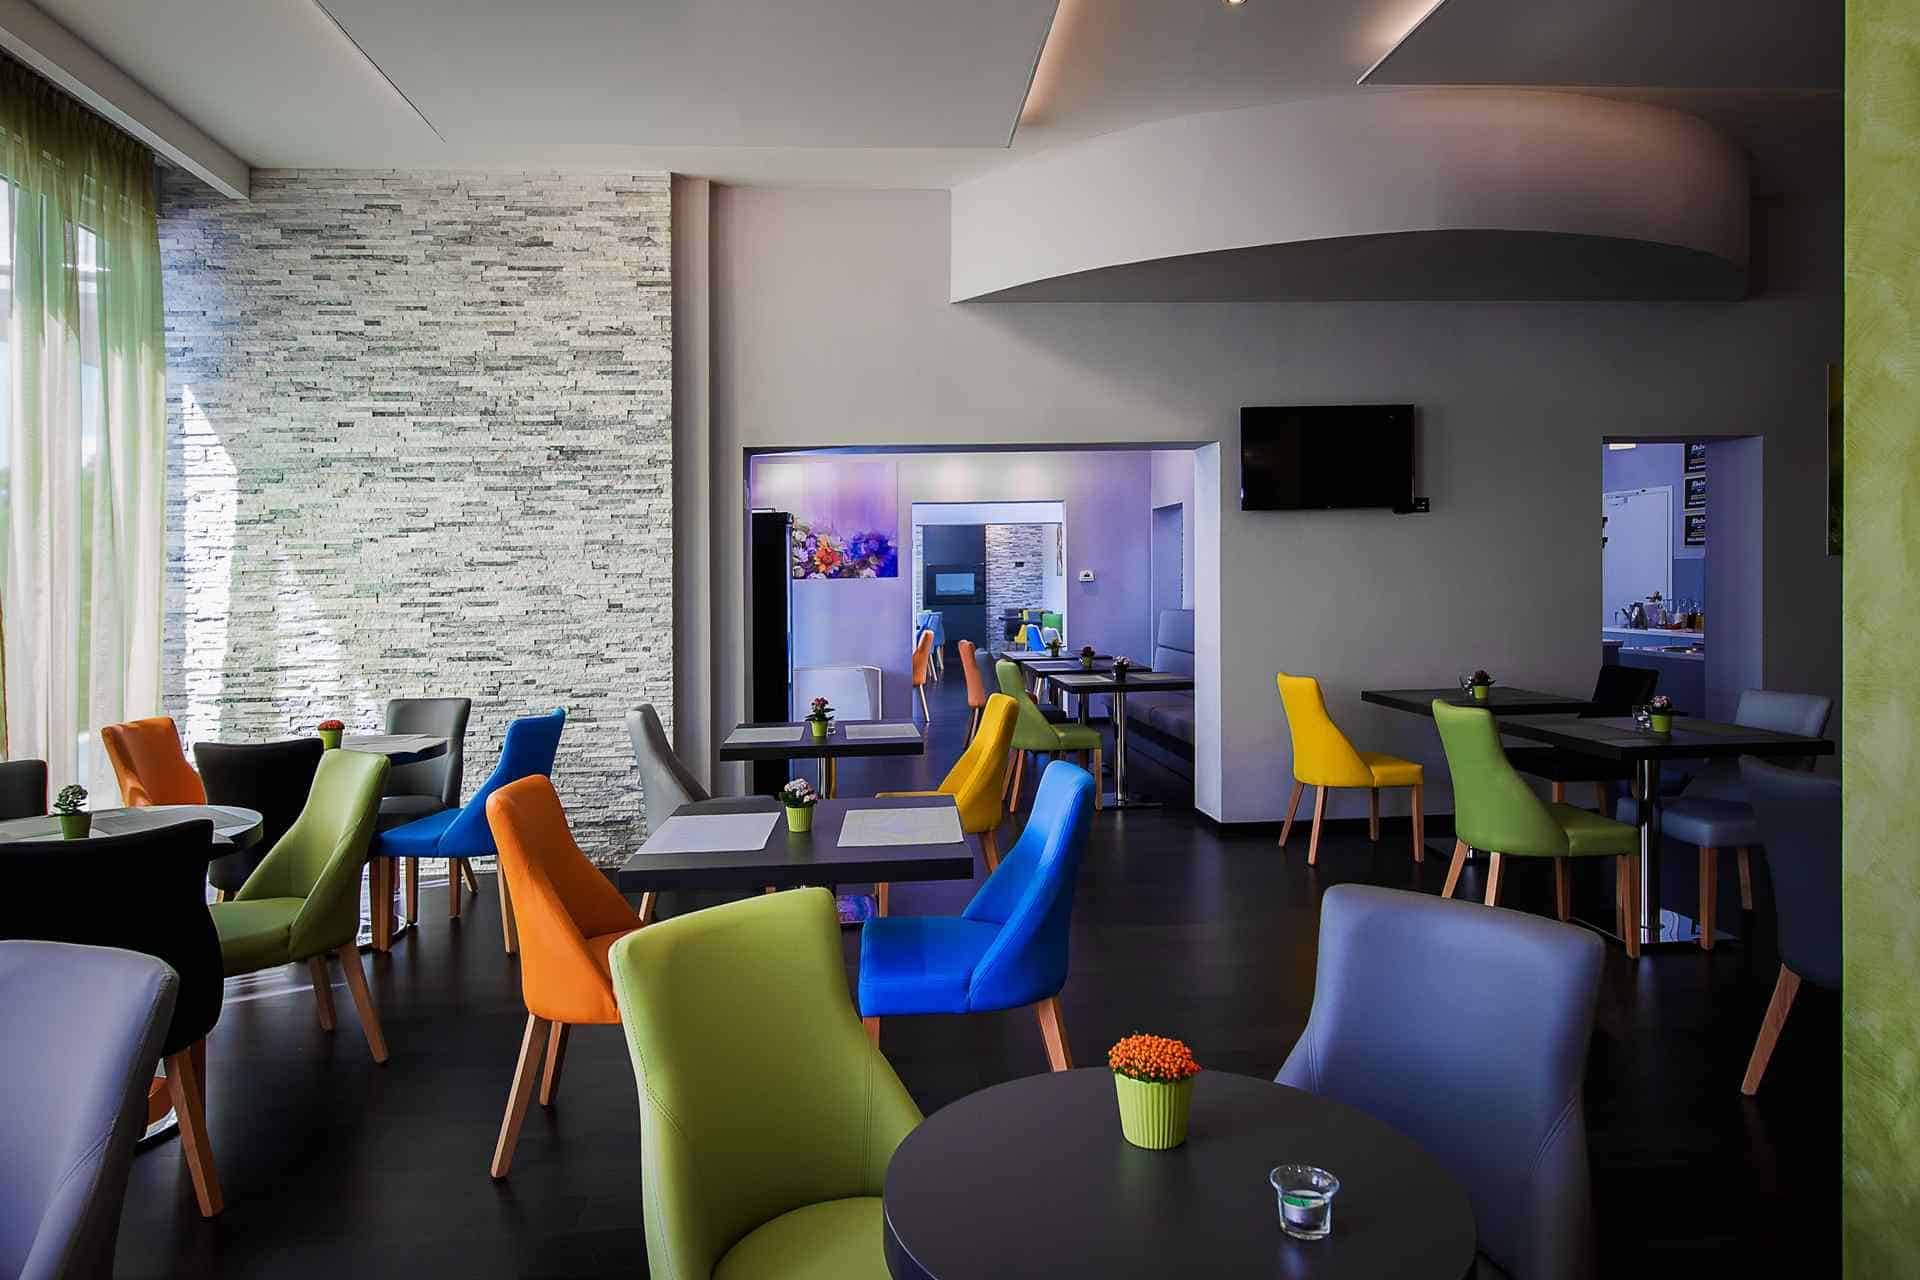 Restoran Villa Magdalena, Krapinske Toplice